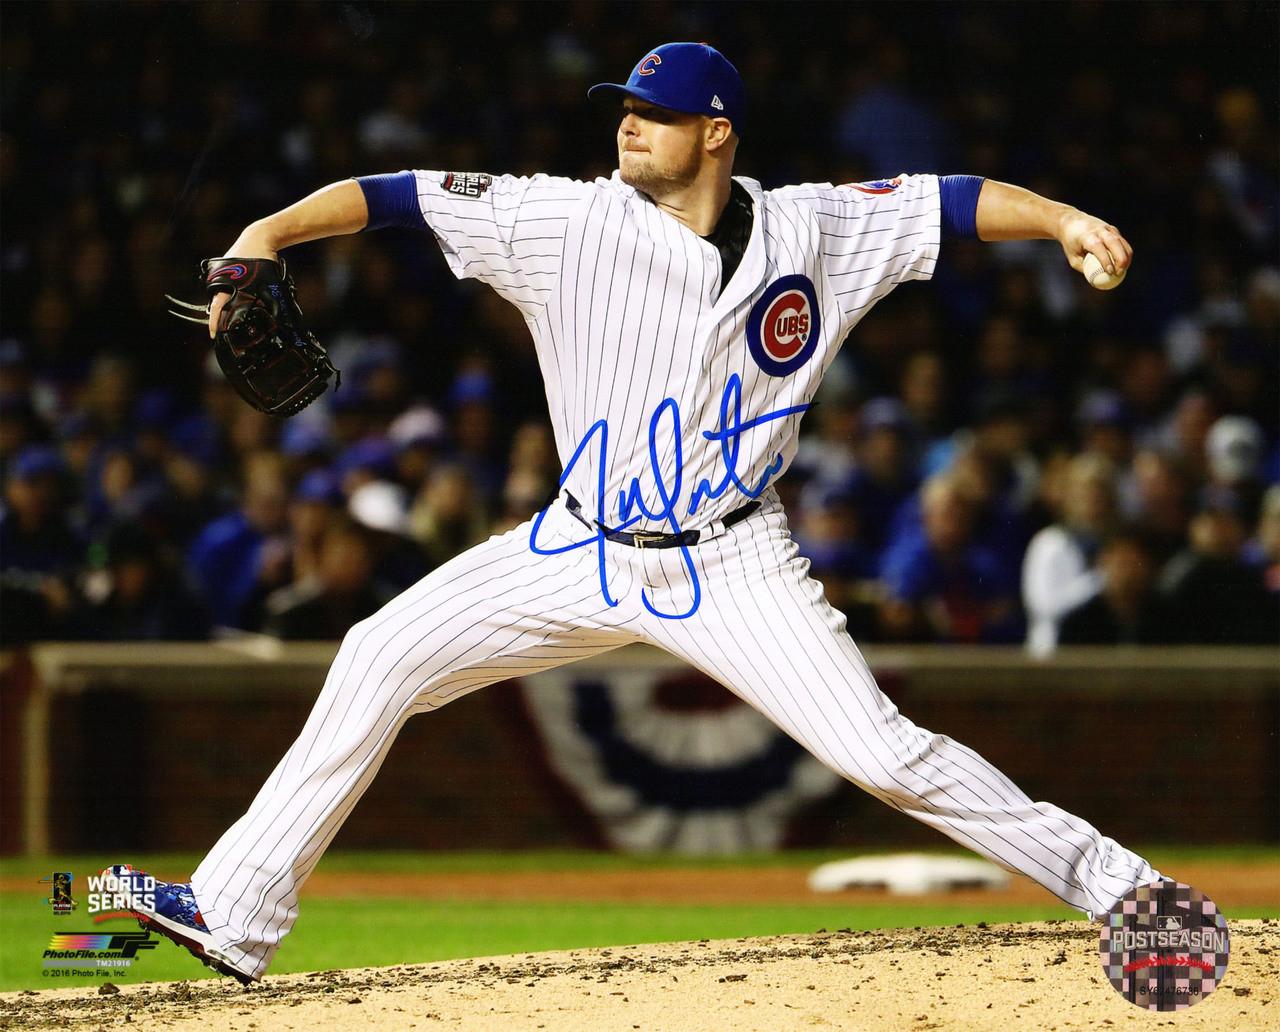 063de1f7a Jon Lester Signed Cubs 2016 World Series 8x10 Photo - Nikco Sports